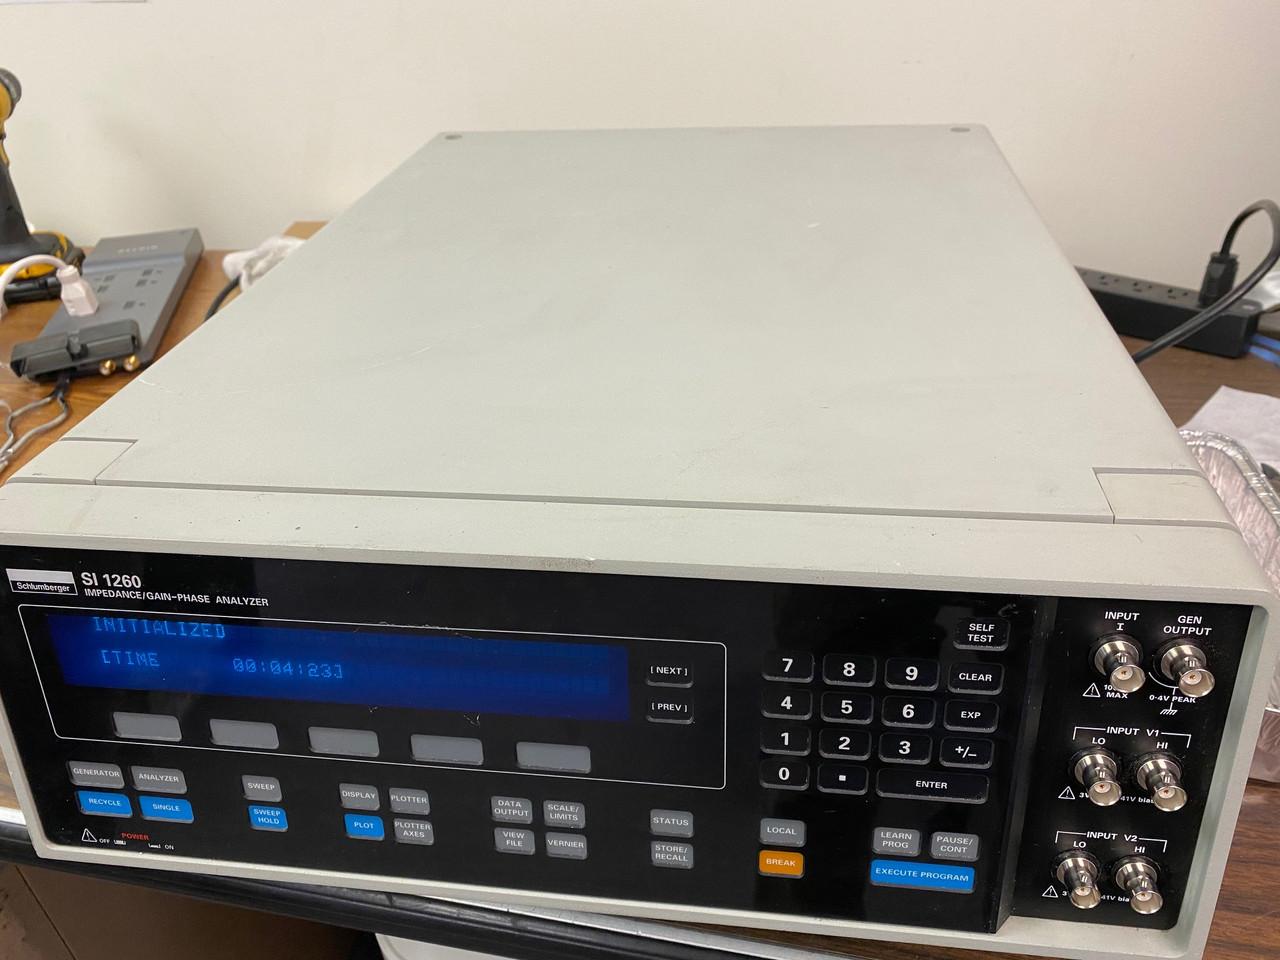 Solartron 1260 Impedance Gain/Phase Analyzer, Used but working